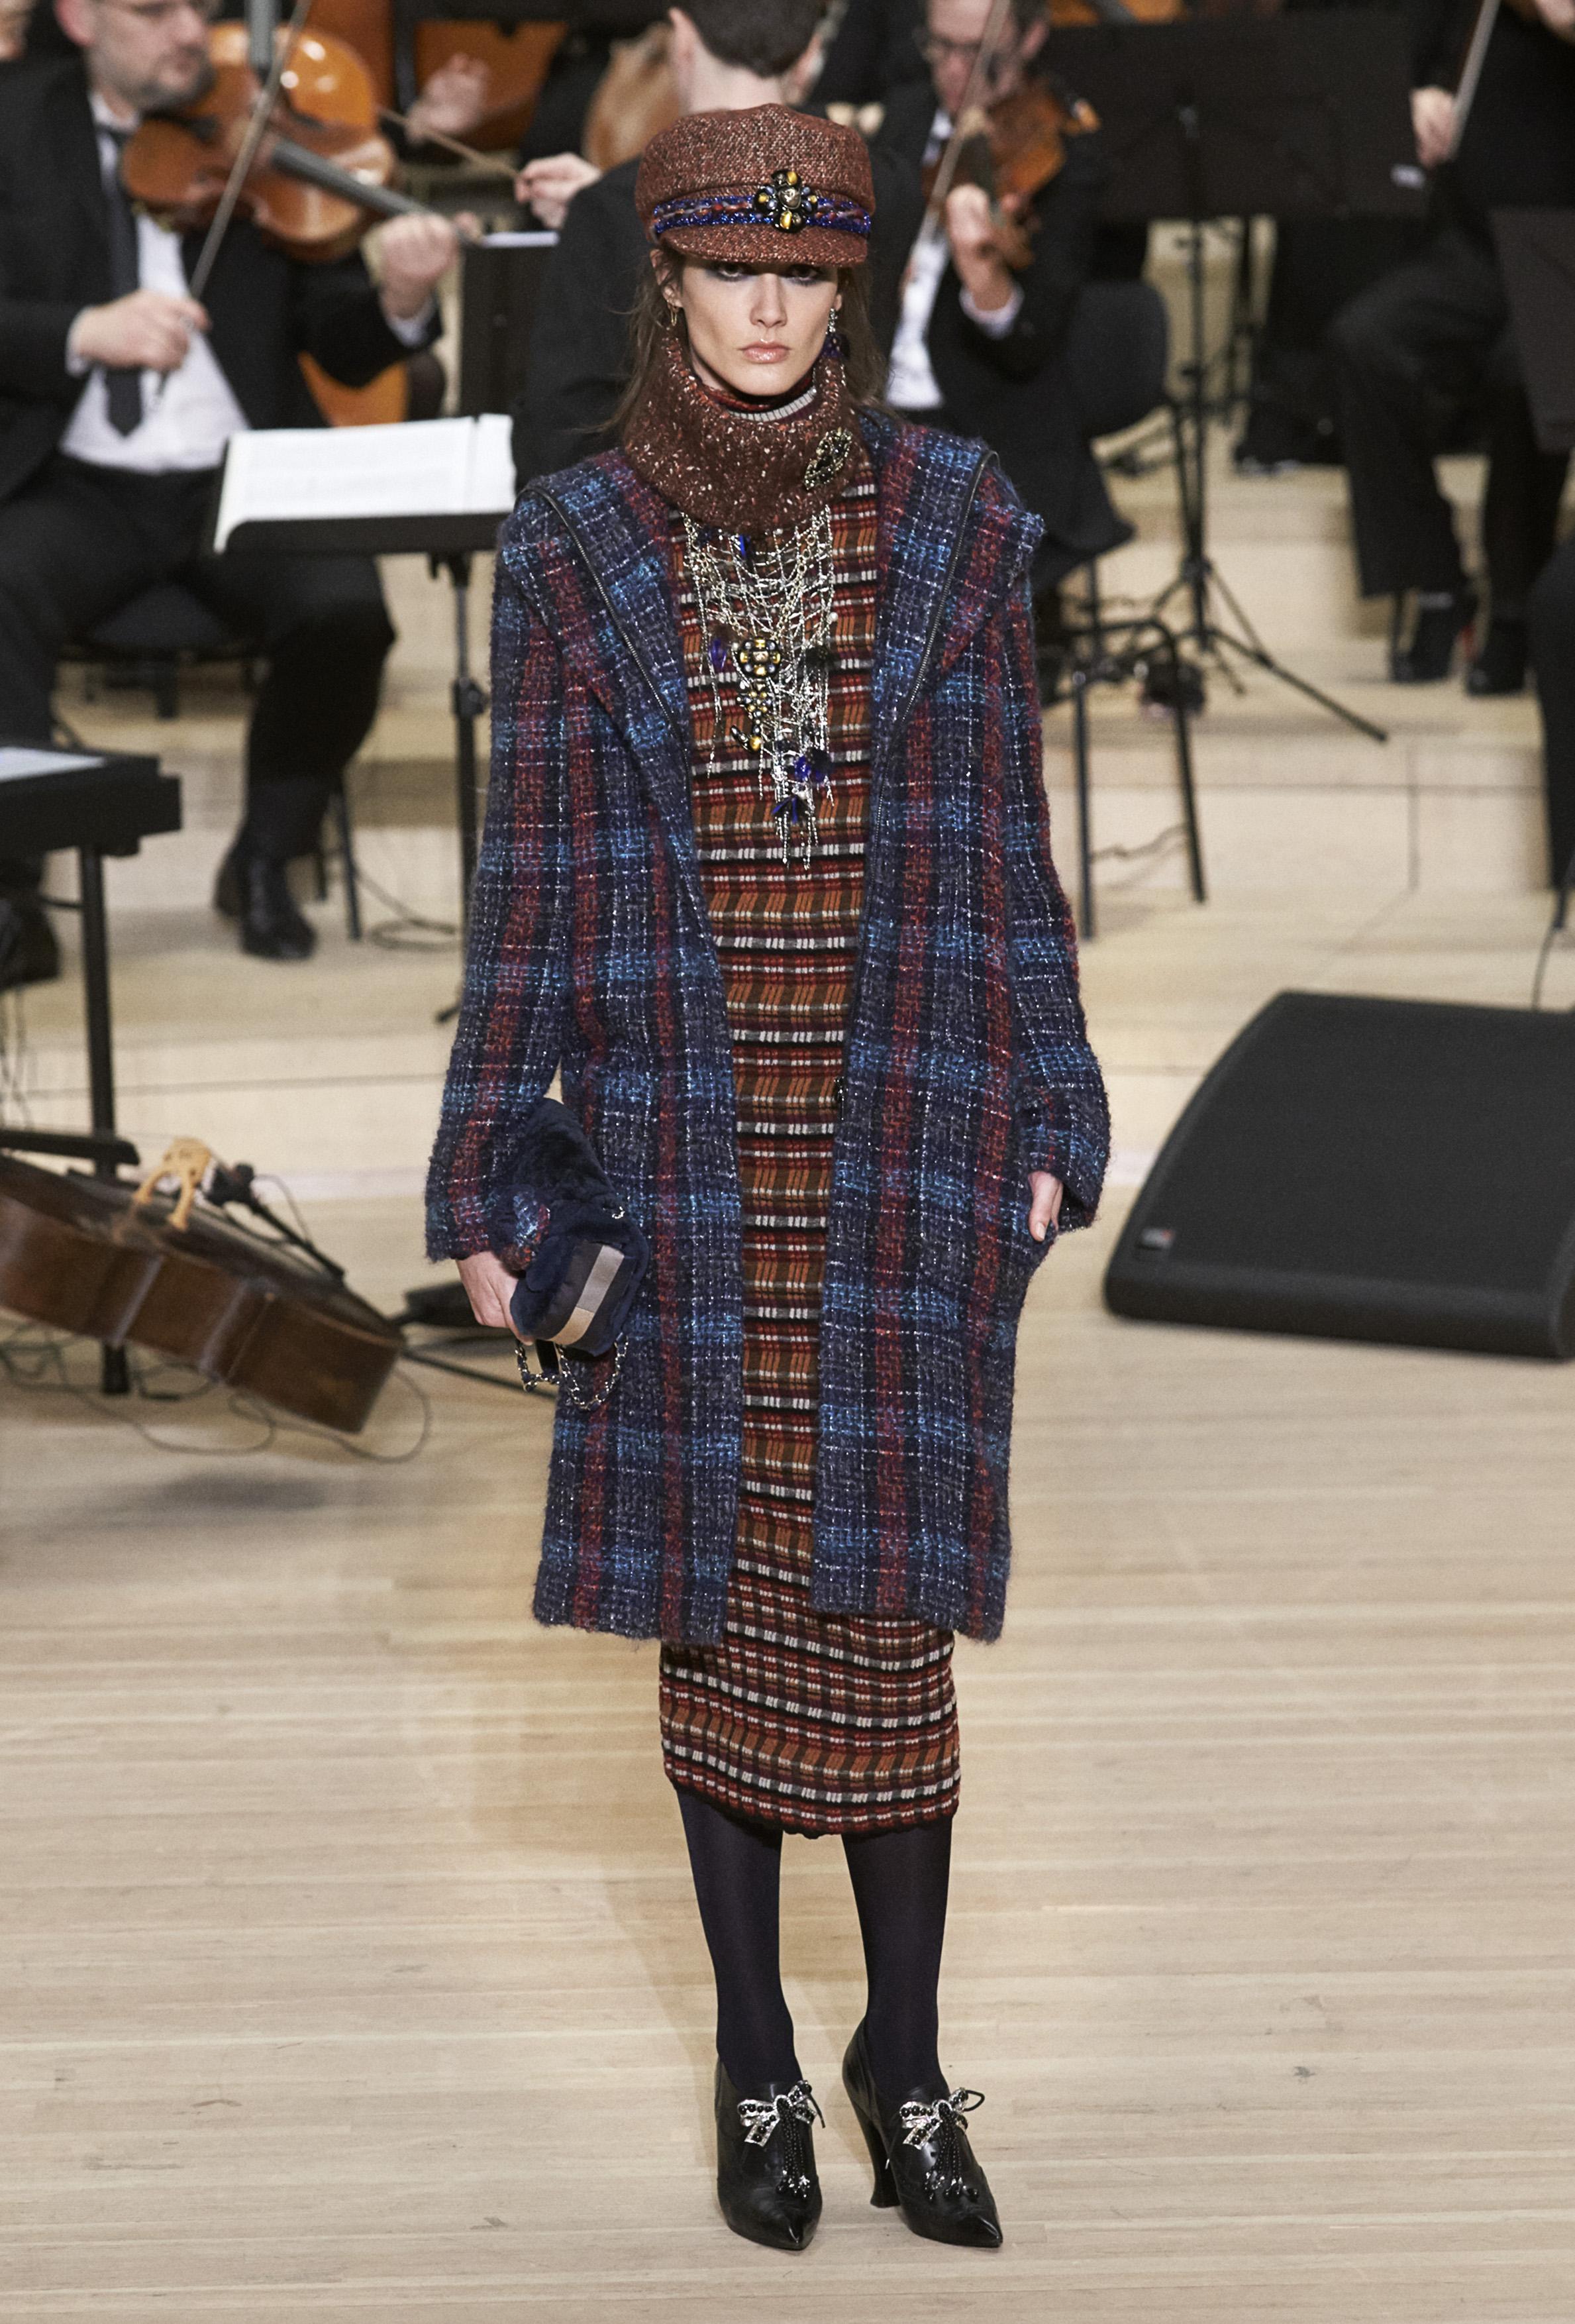 Chanel Métiers d'Art 2018, foto